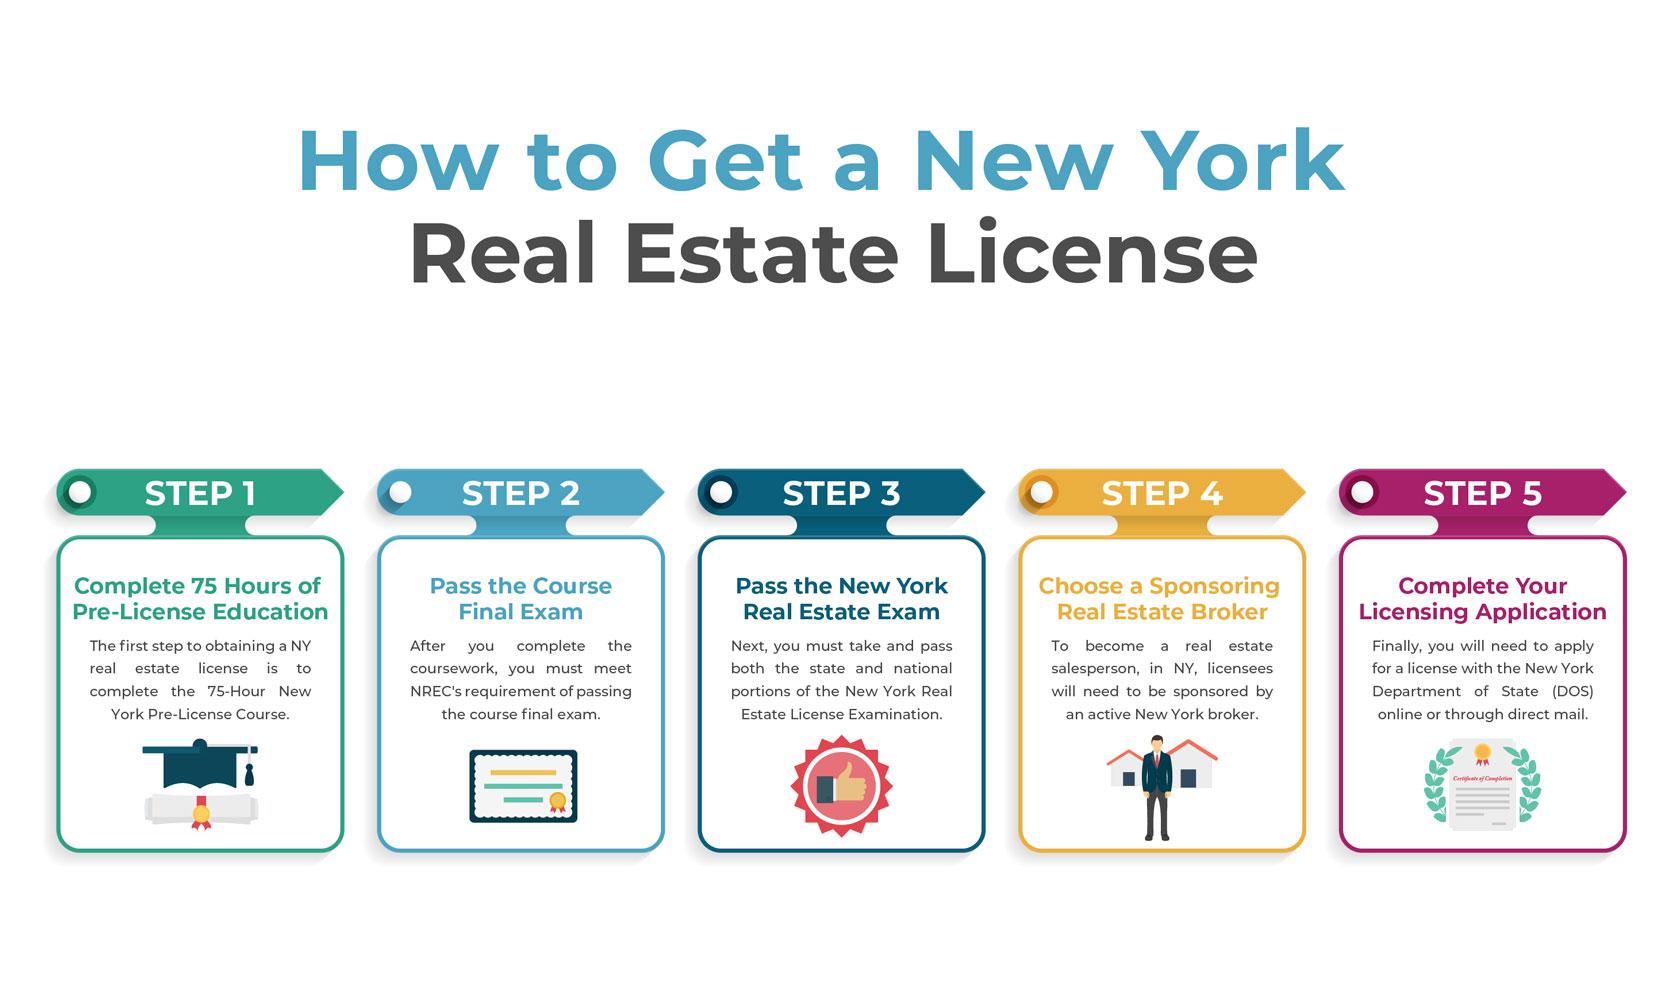 New York Real Estate License